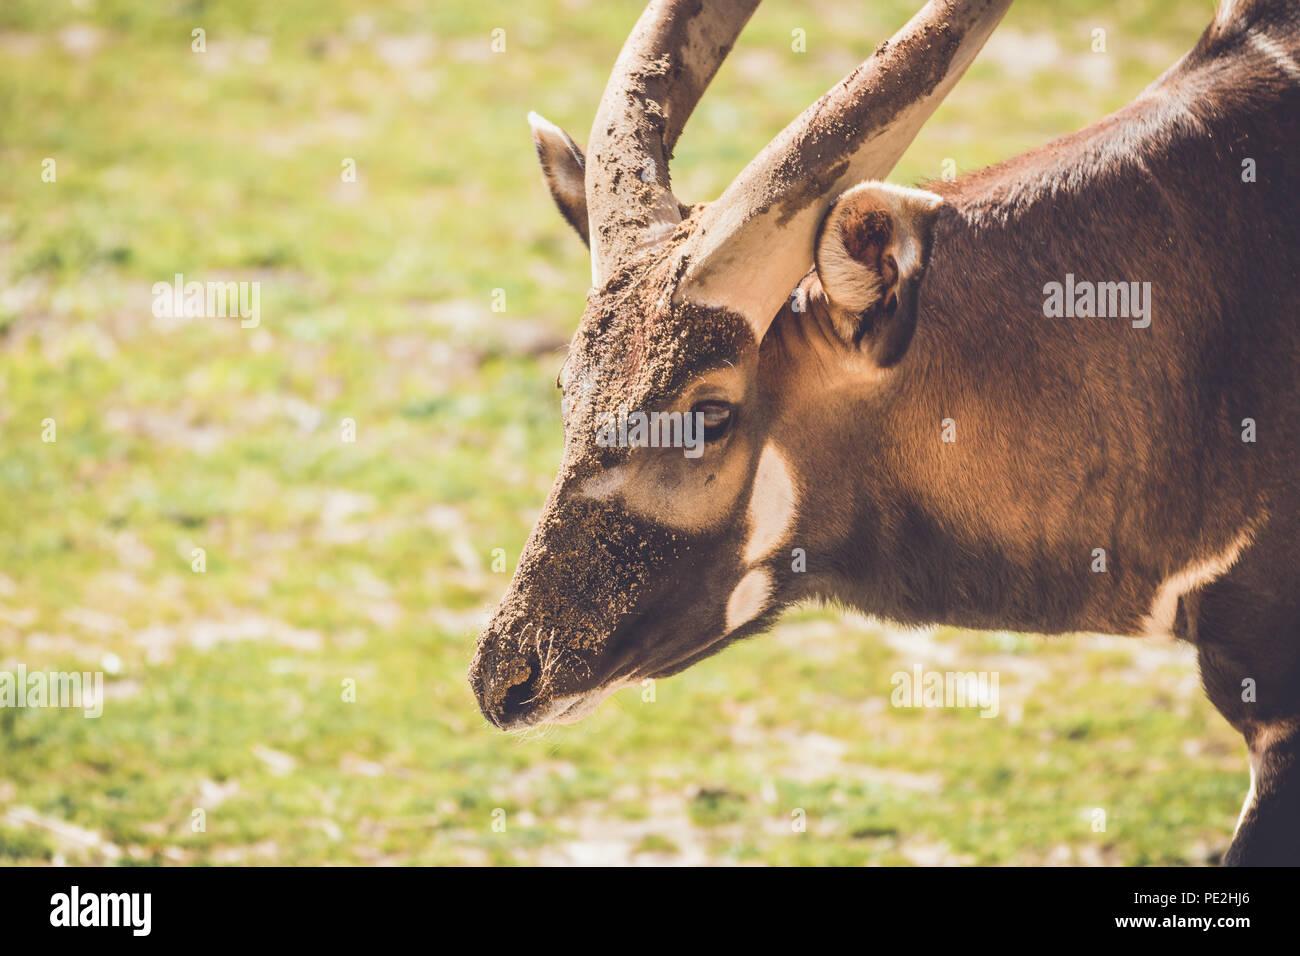 African Bongo (Tragelaphus eurycerus) walks along quietly on sandy grass in vintage garden setting - Stock Image